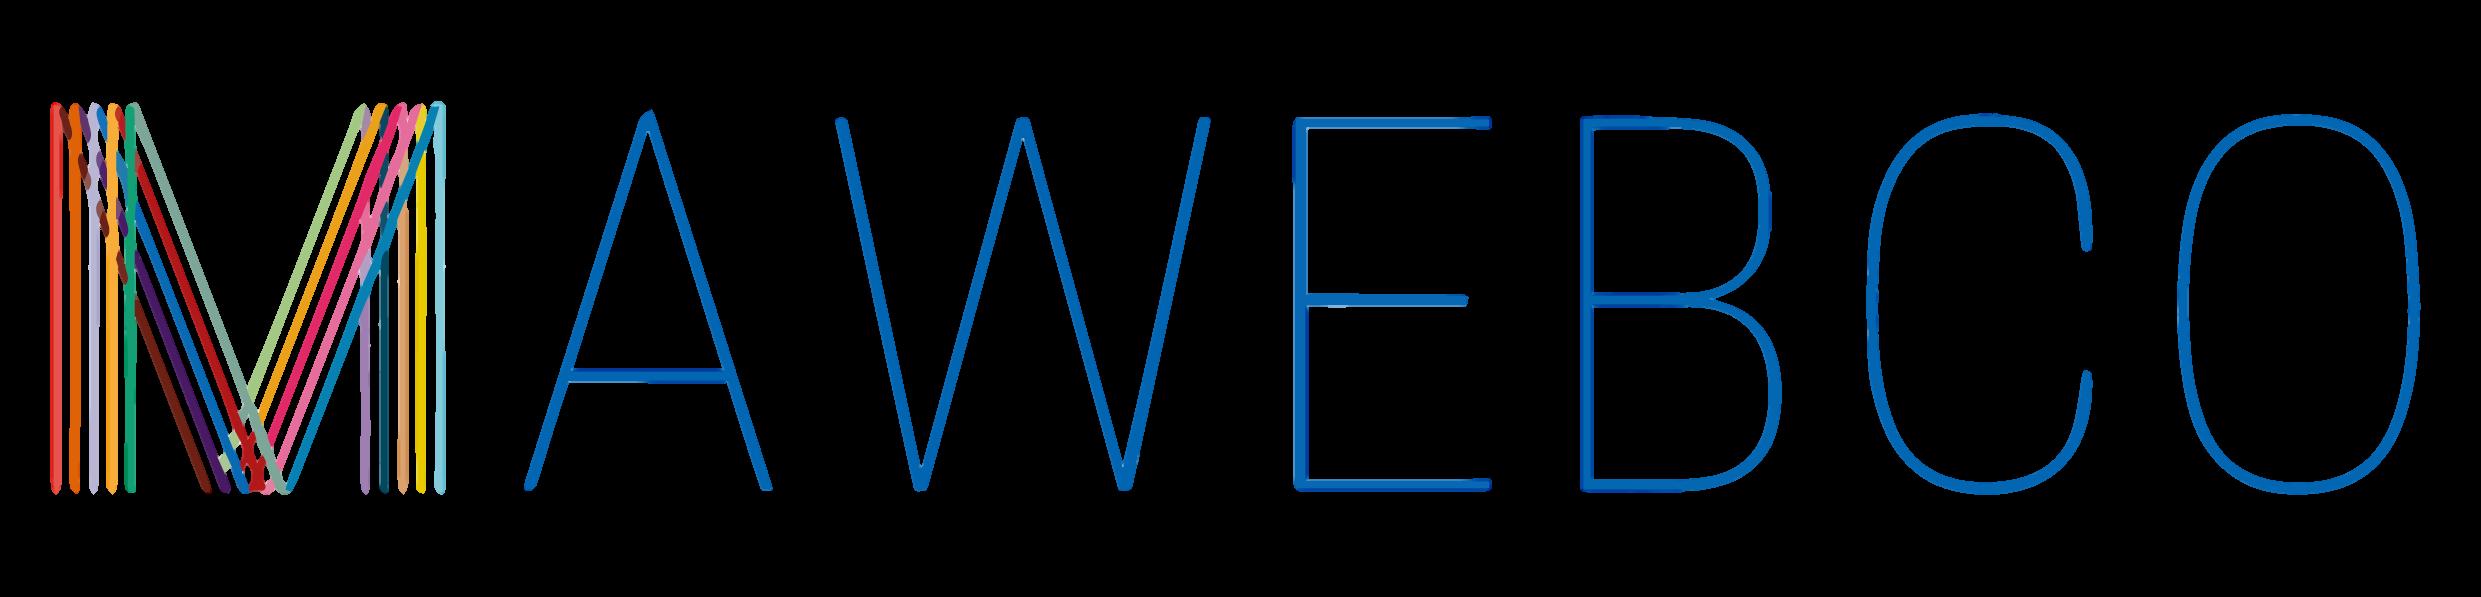 logo MAWEBCO